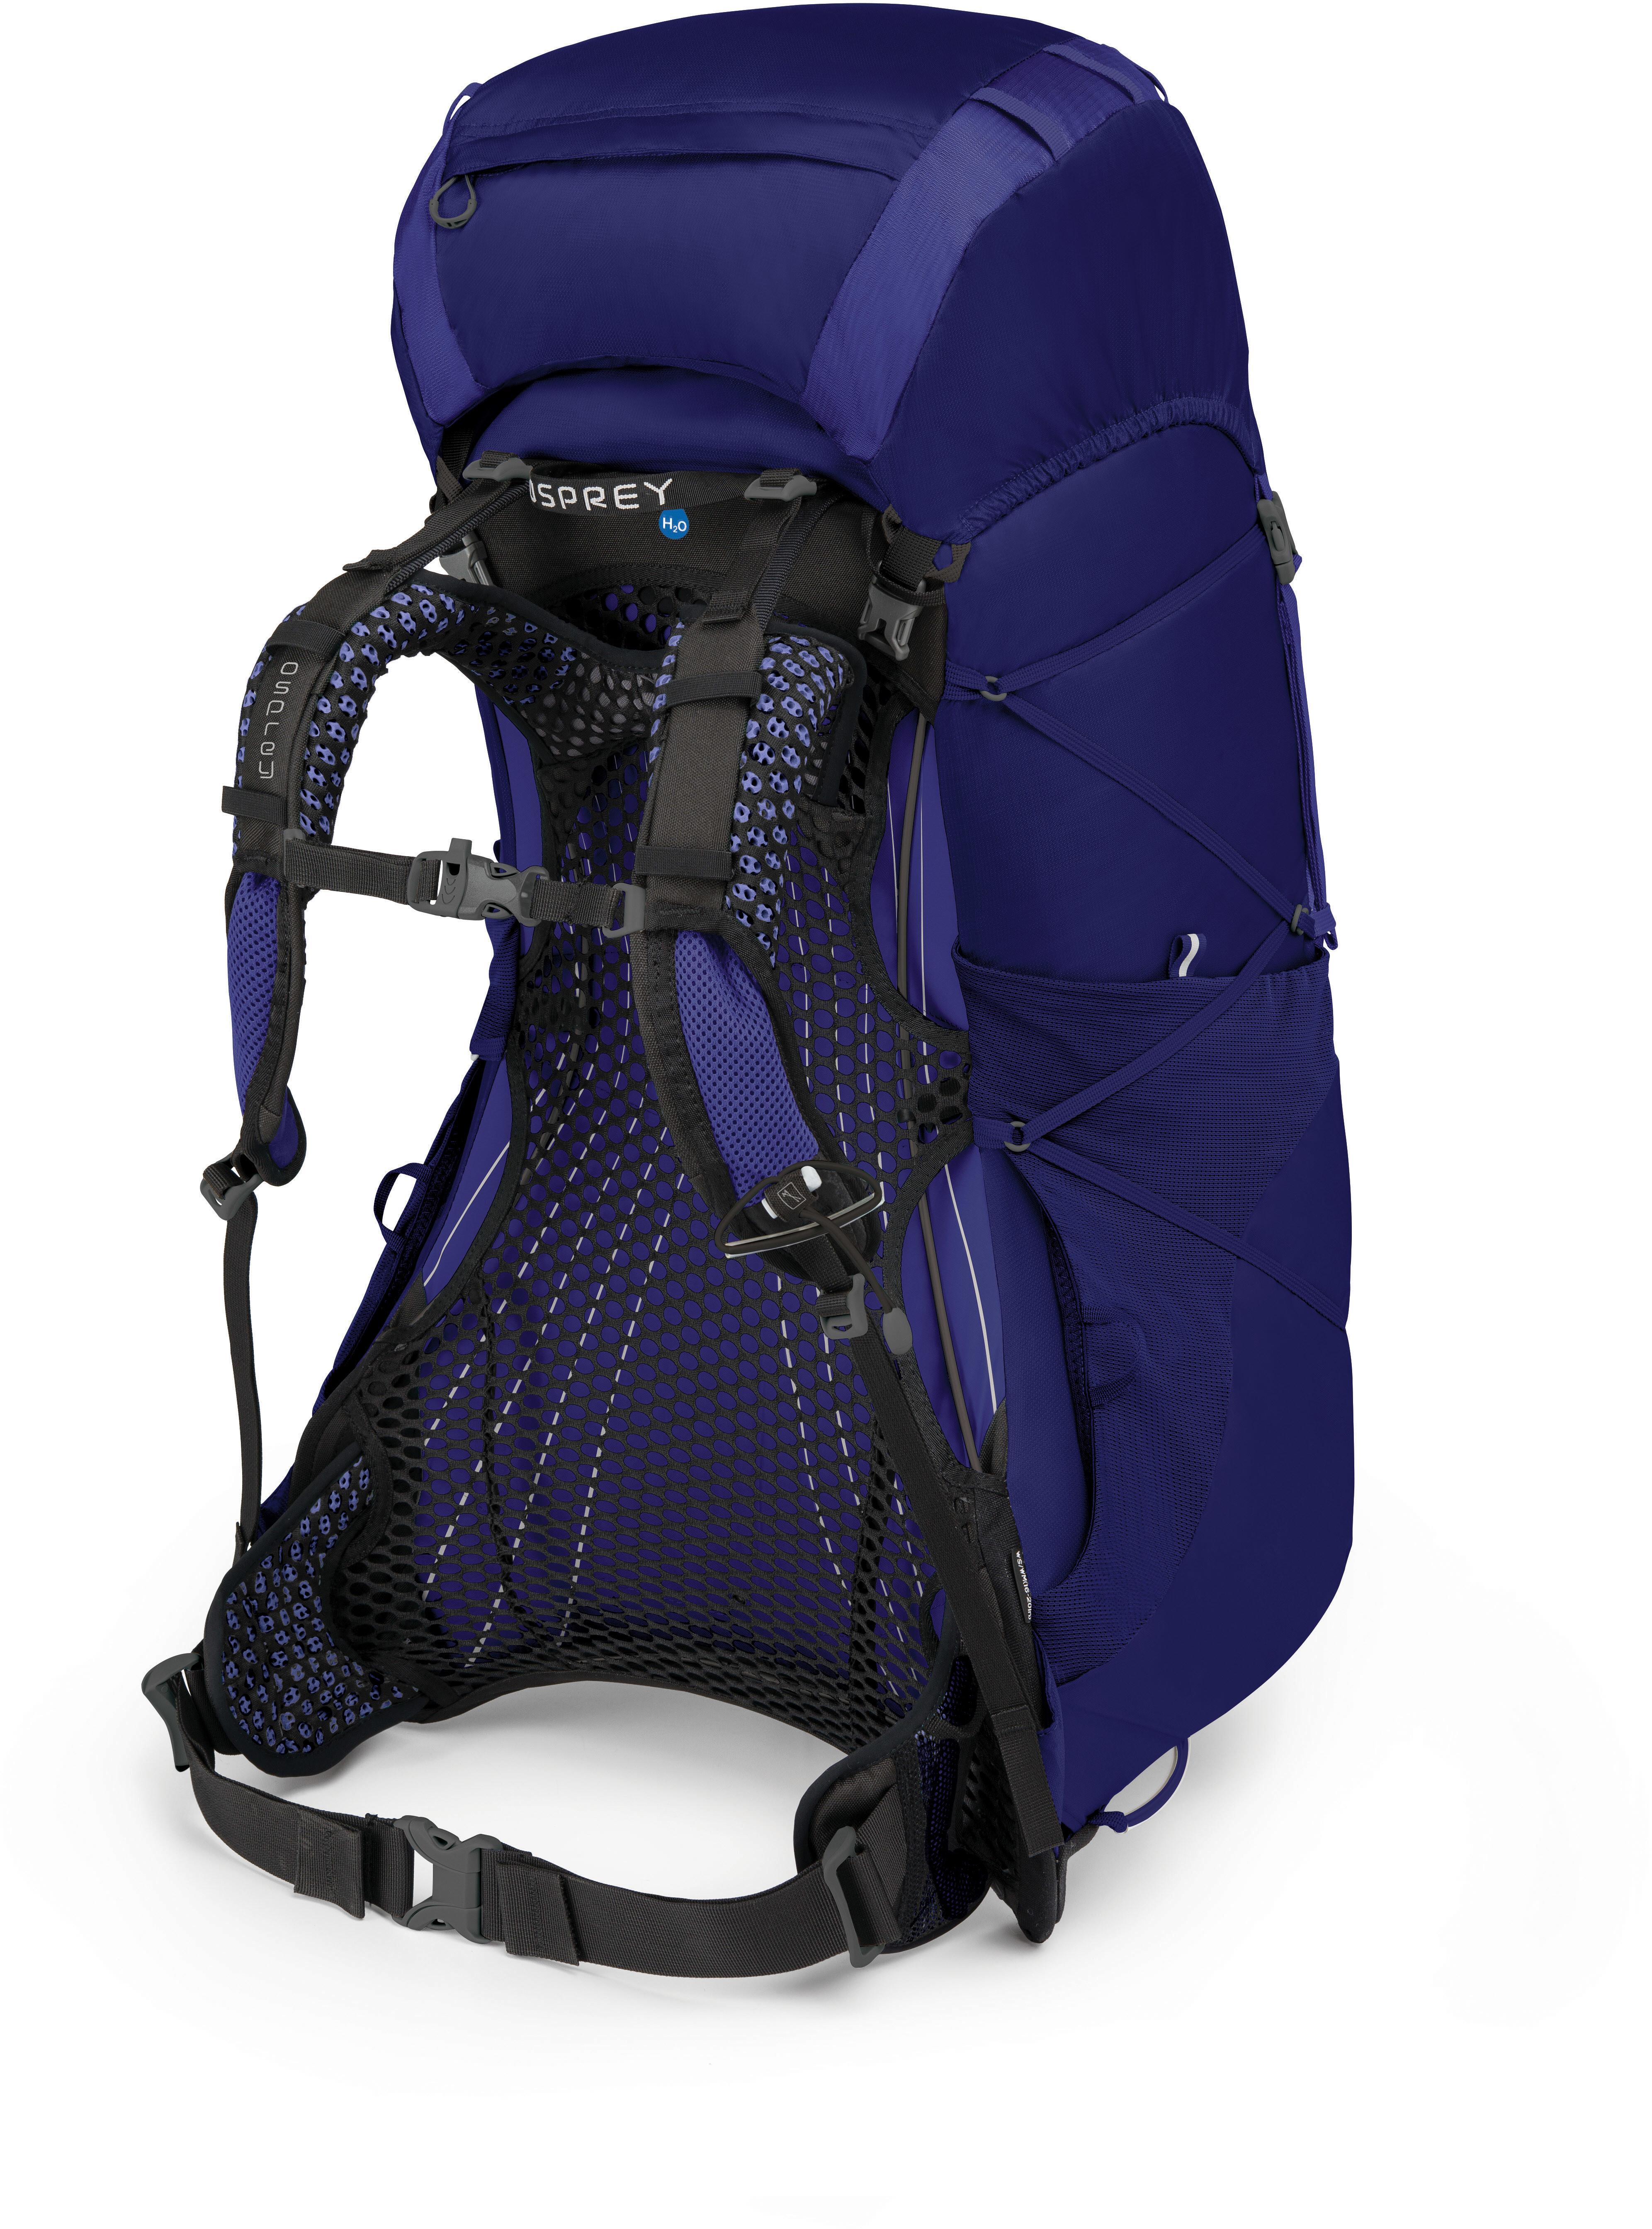 New Osprey Women's Eja Lightweight 38 Backpack